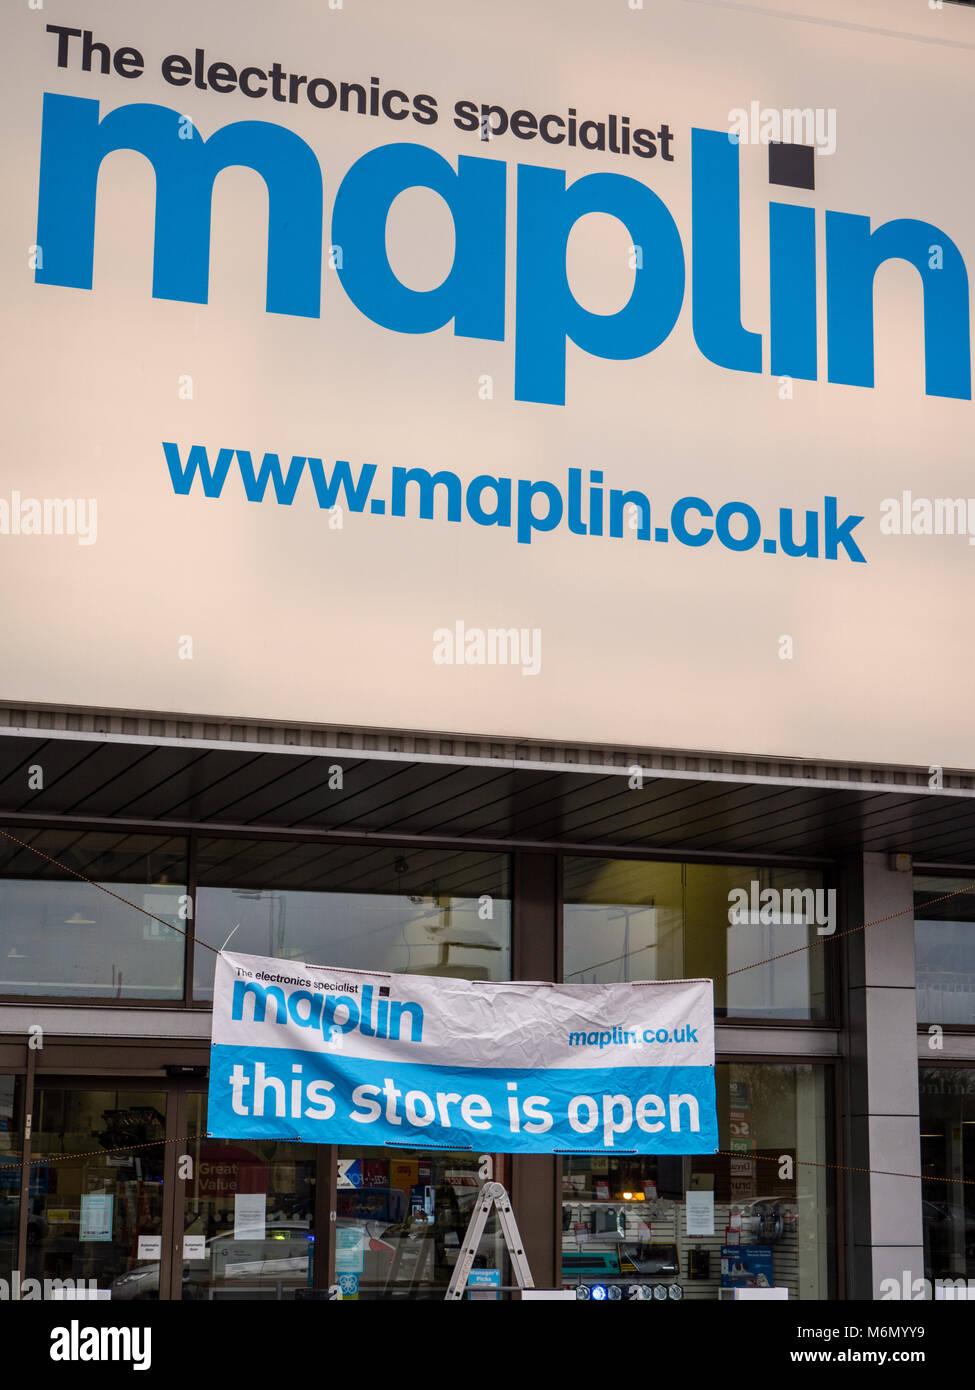 Maplin Electronic Store, Reading, Berkshire, England. - Stock Image